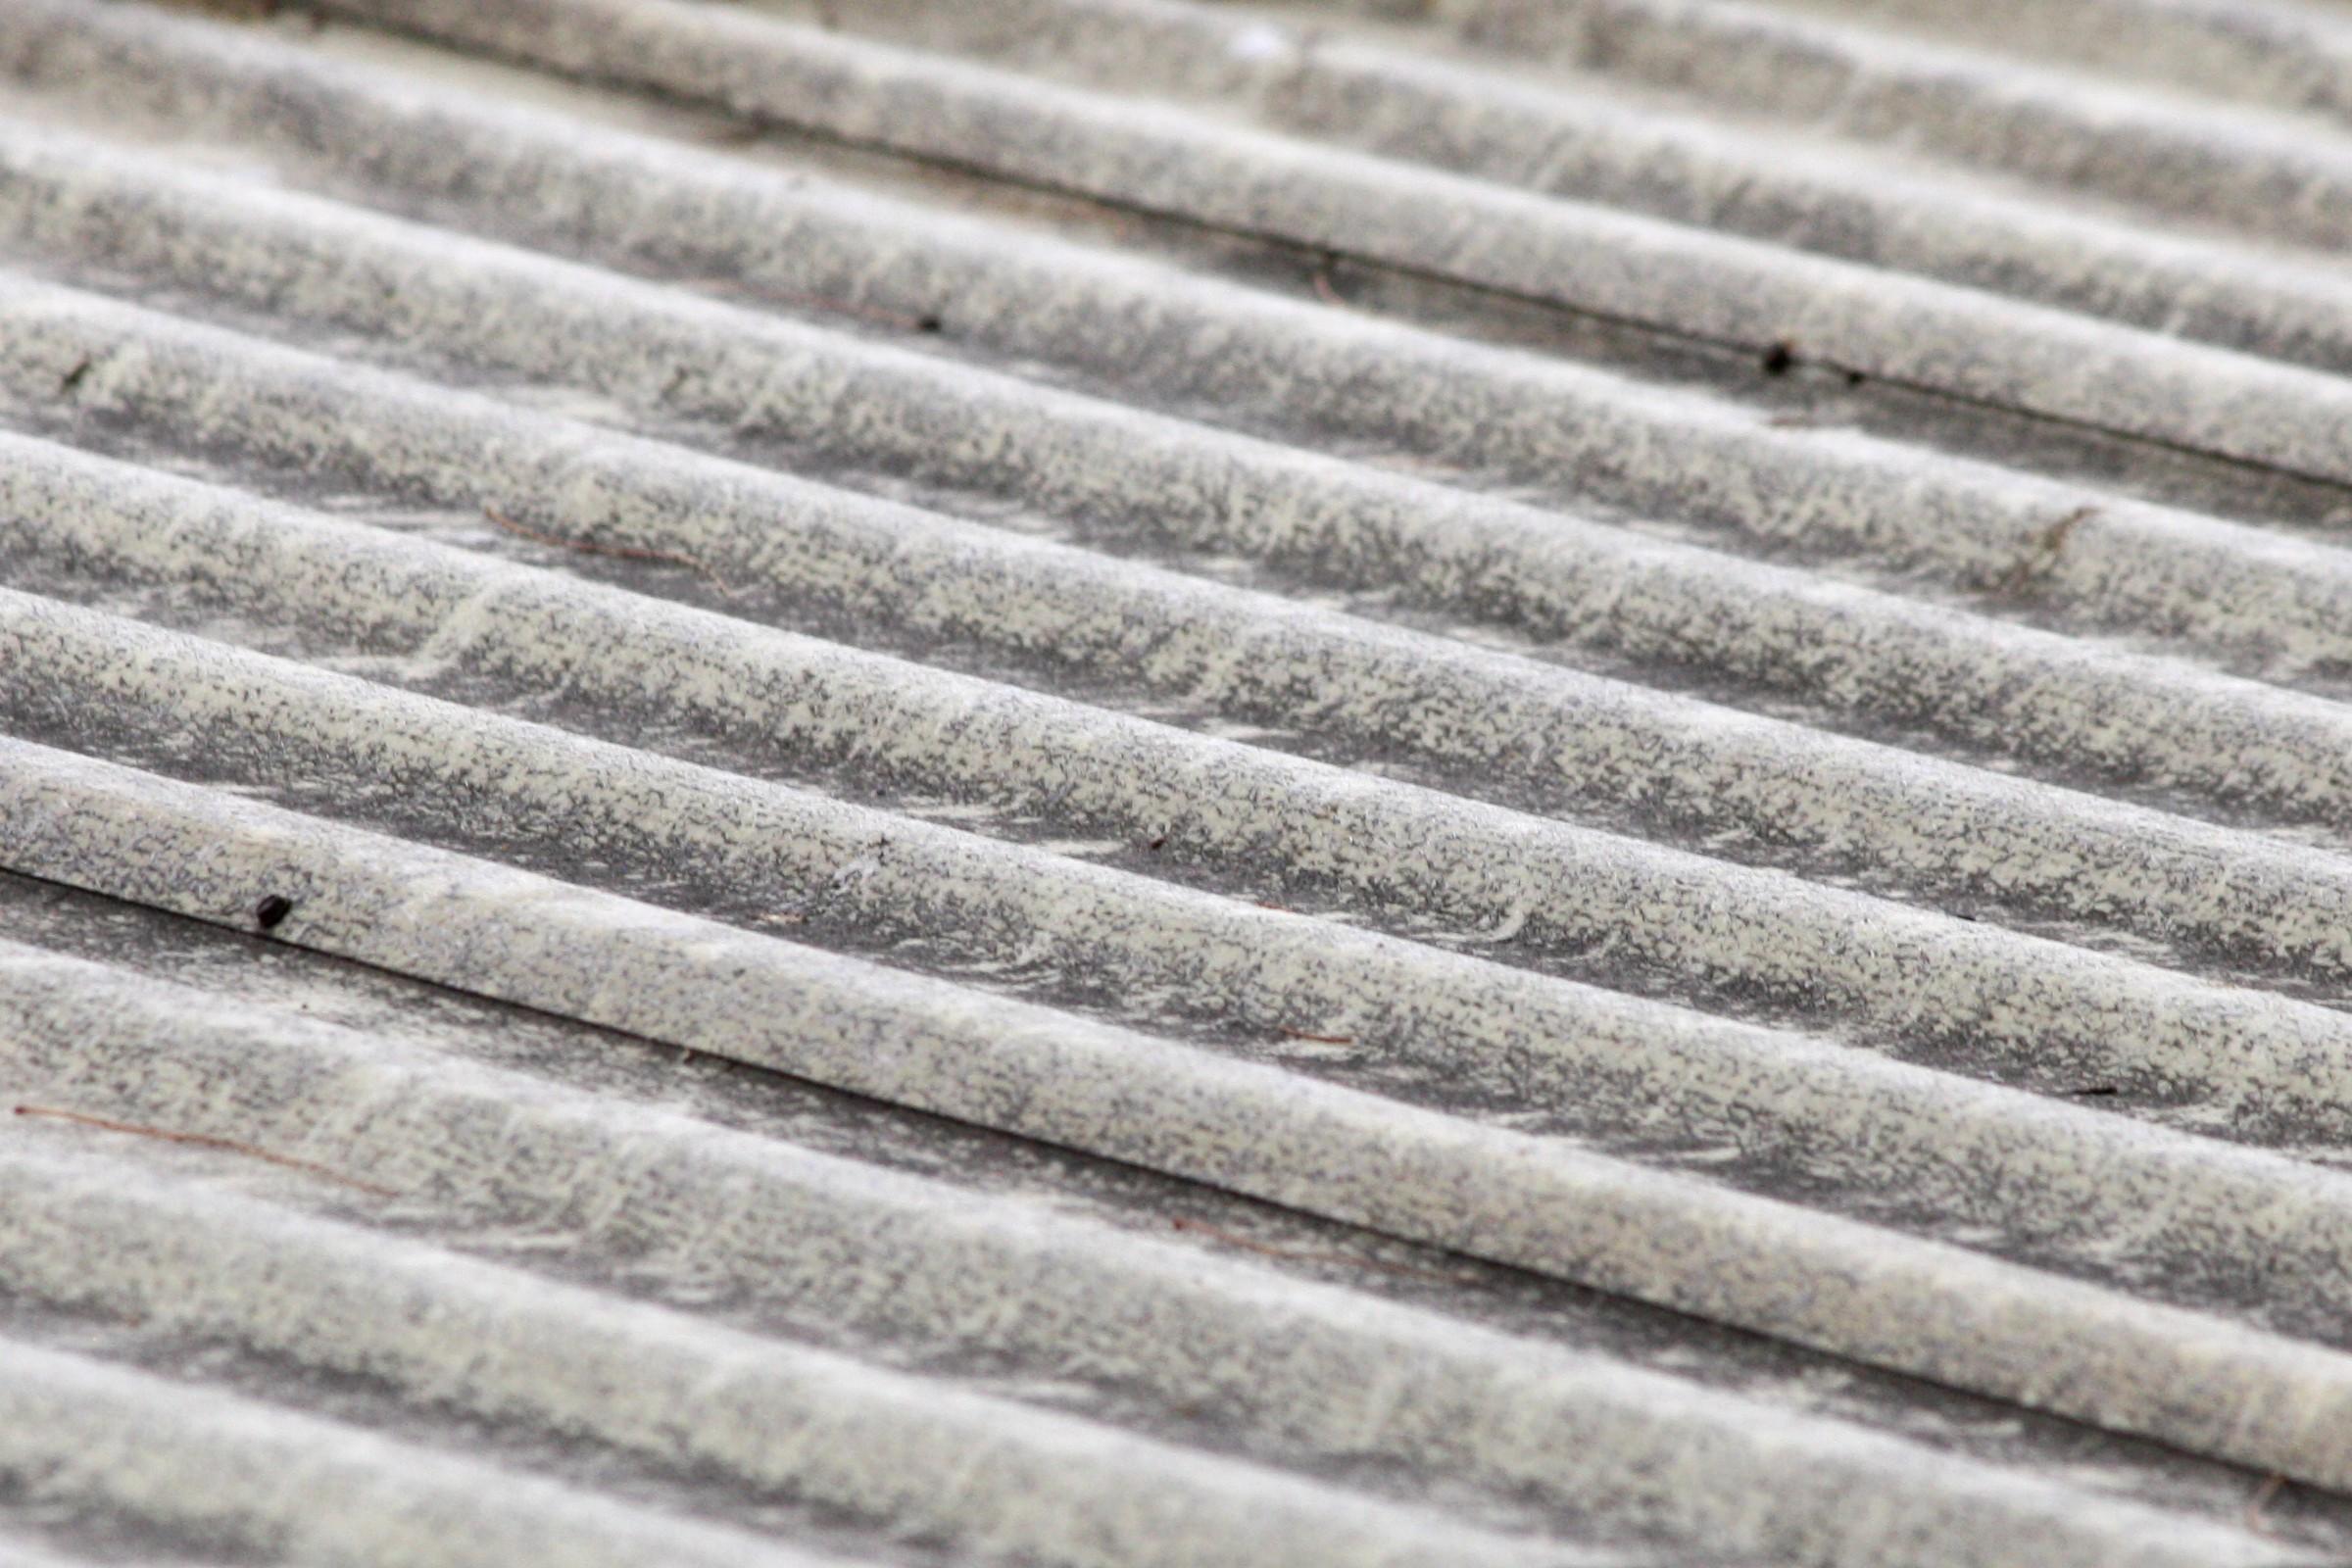 Corrugated Fiberglass Siding : Corrugated fiberglass greenhouse roof texture picture